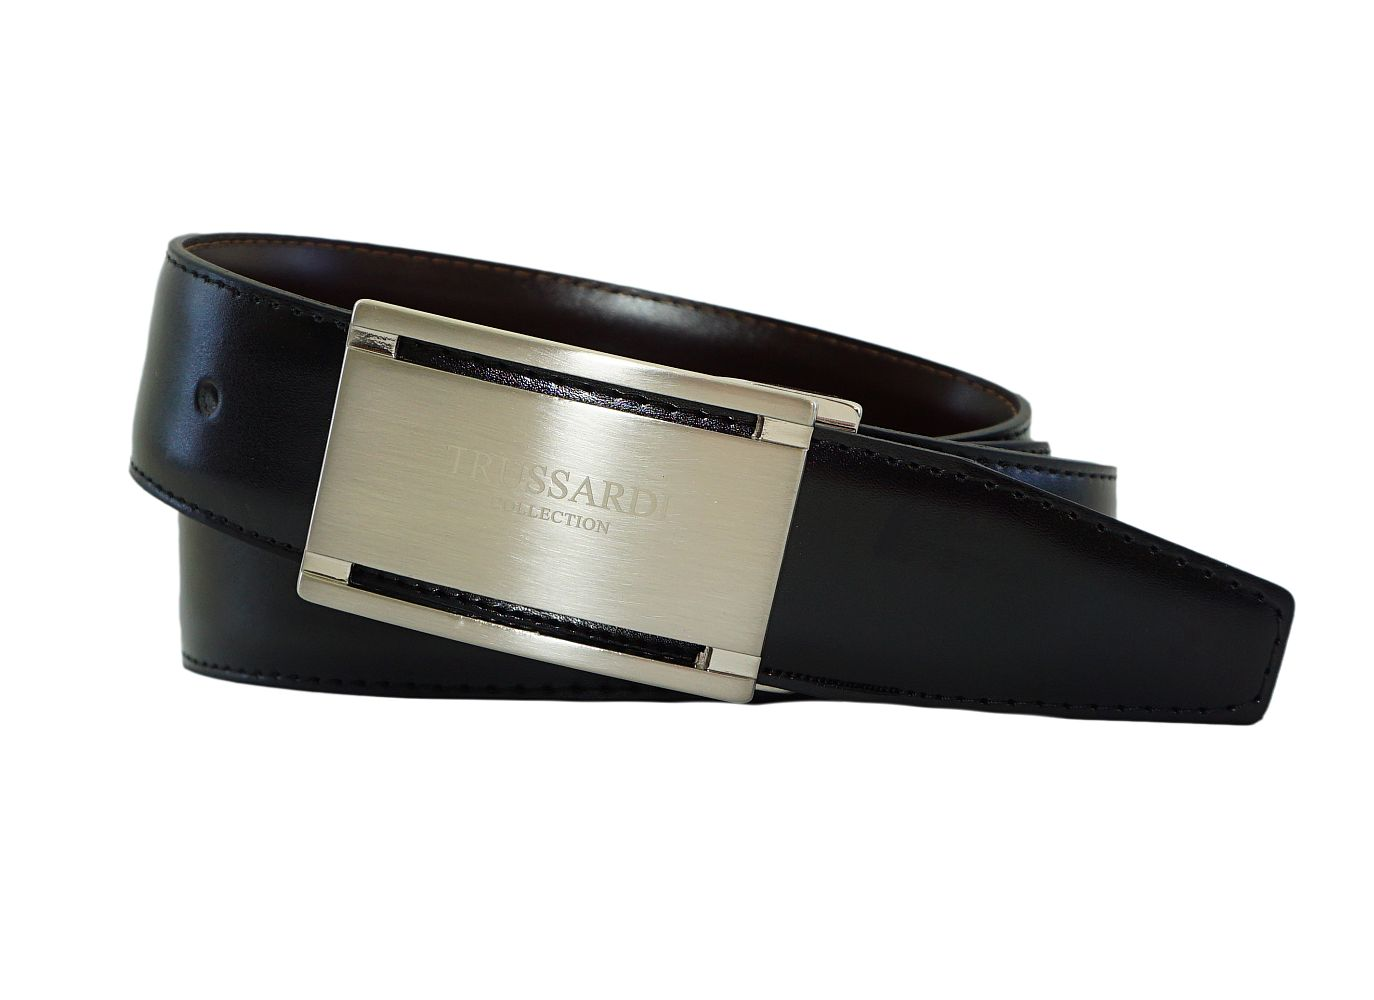 Trussardi Gürtel Ledergürtel bis 125 cm verstellbar mit Metallschließe U31TRC00037